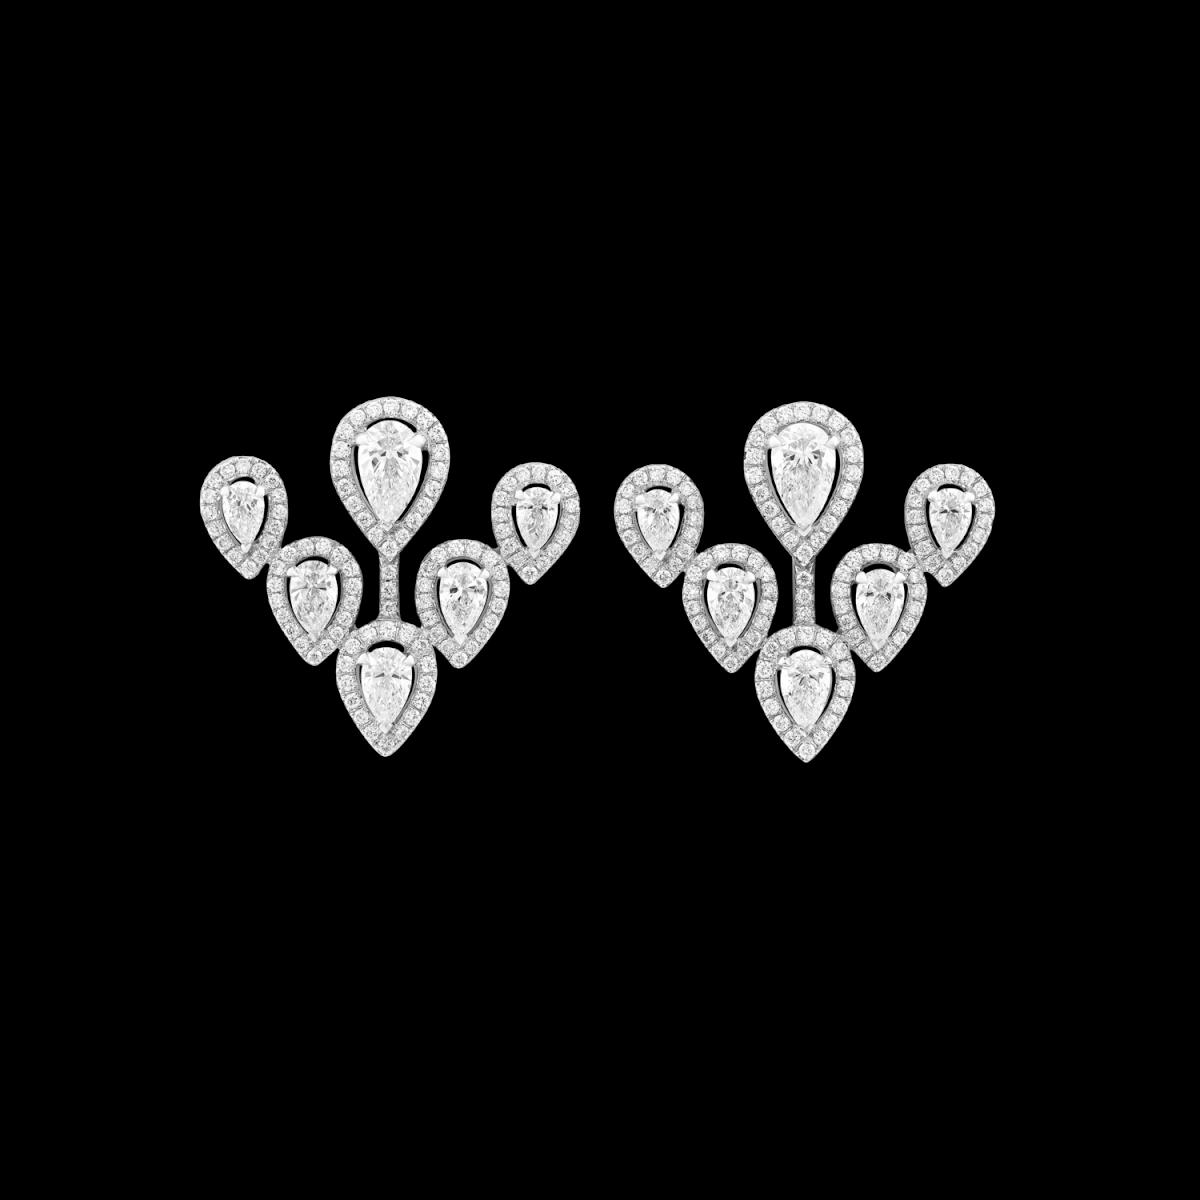 Ariana white gold earrings with diamonds